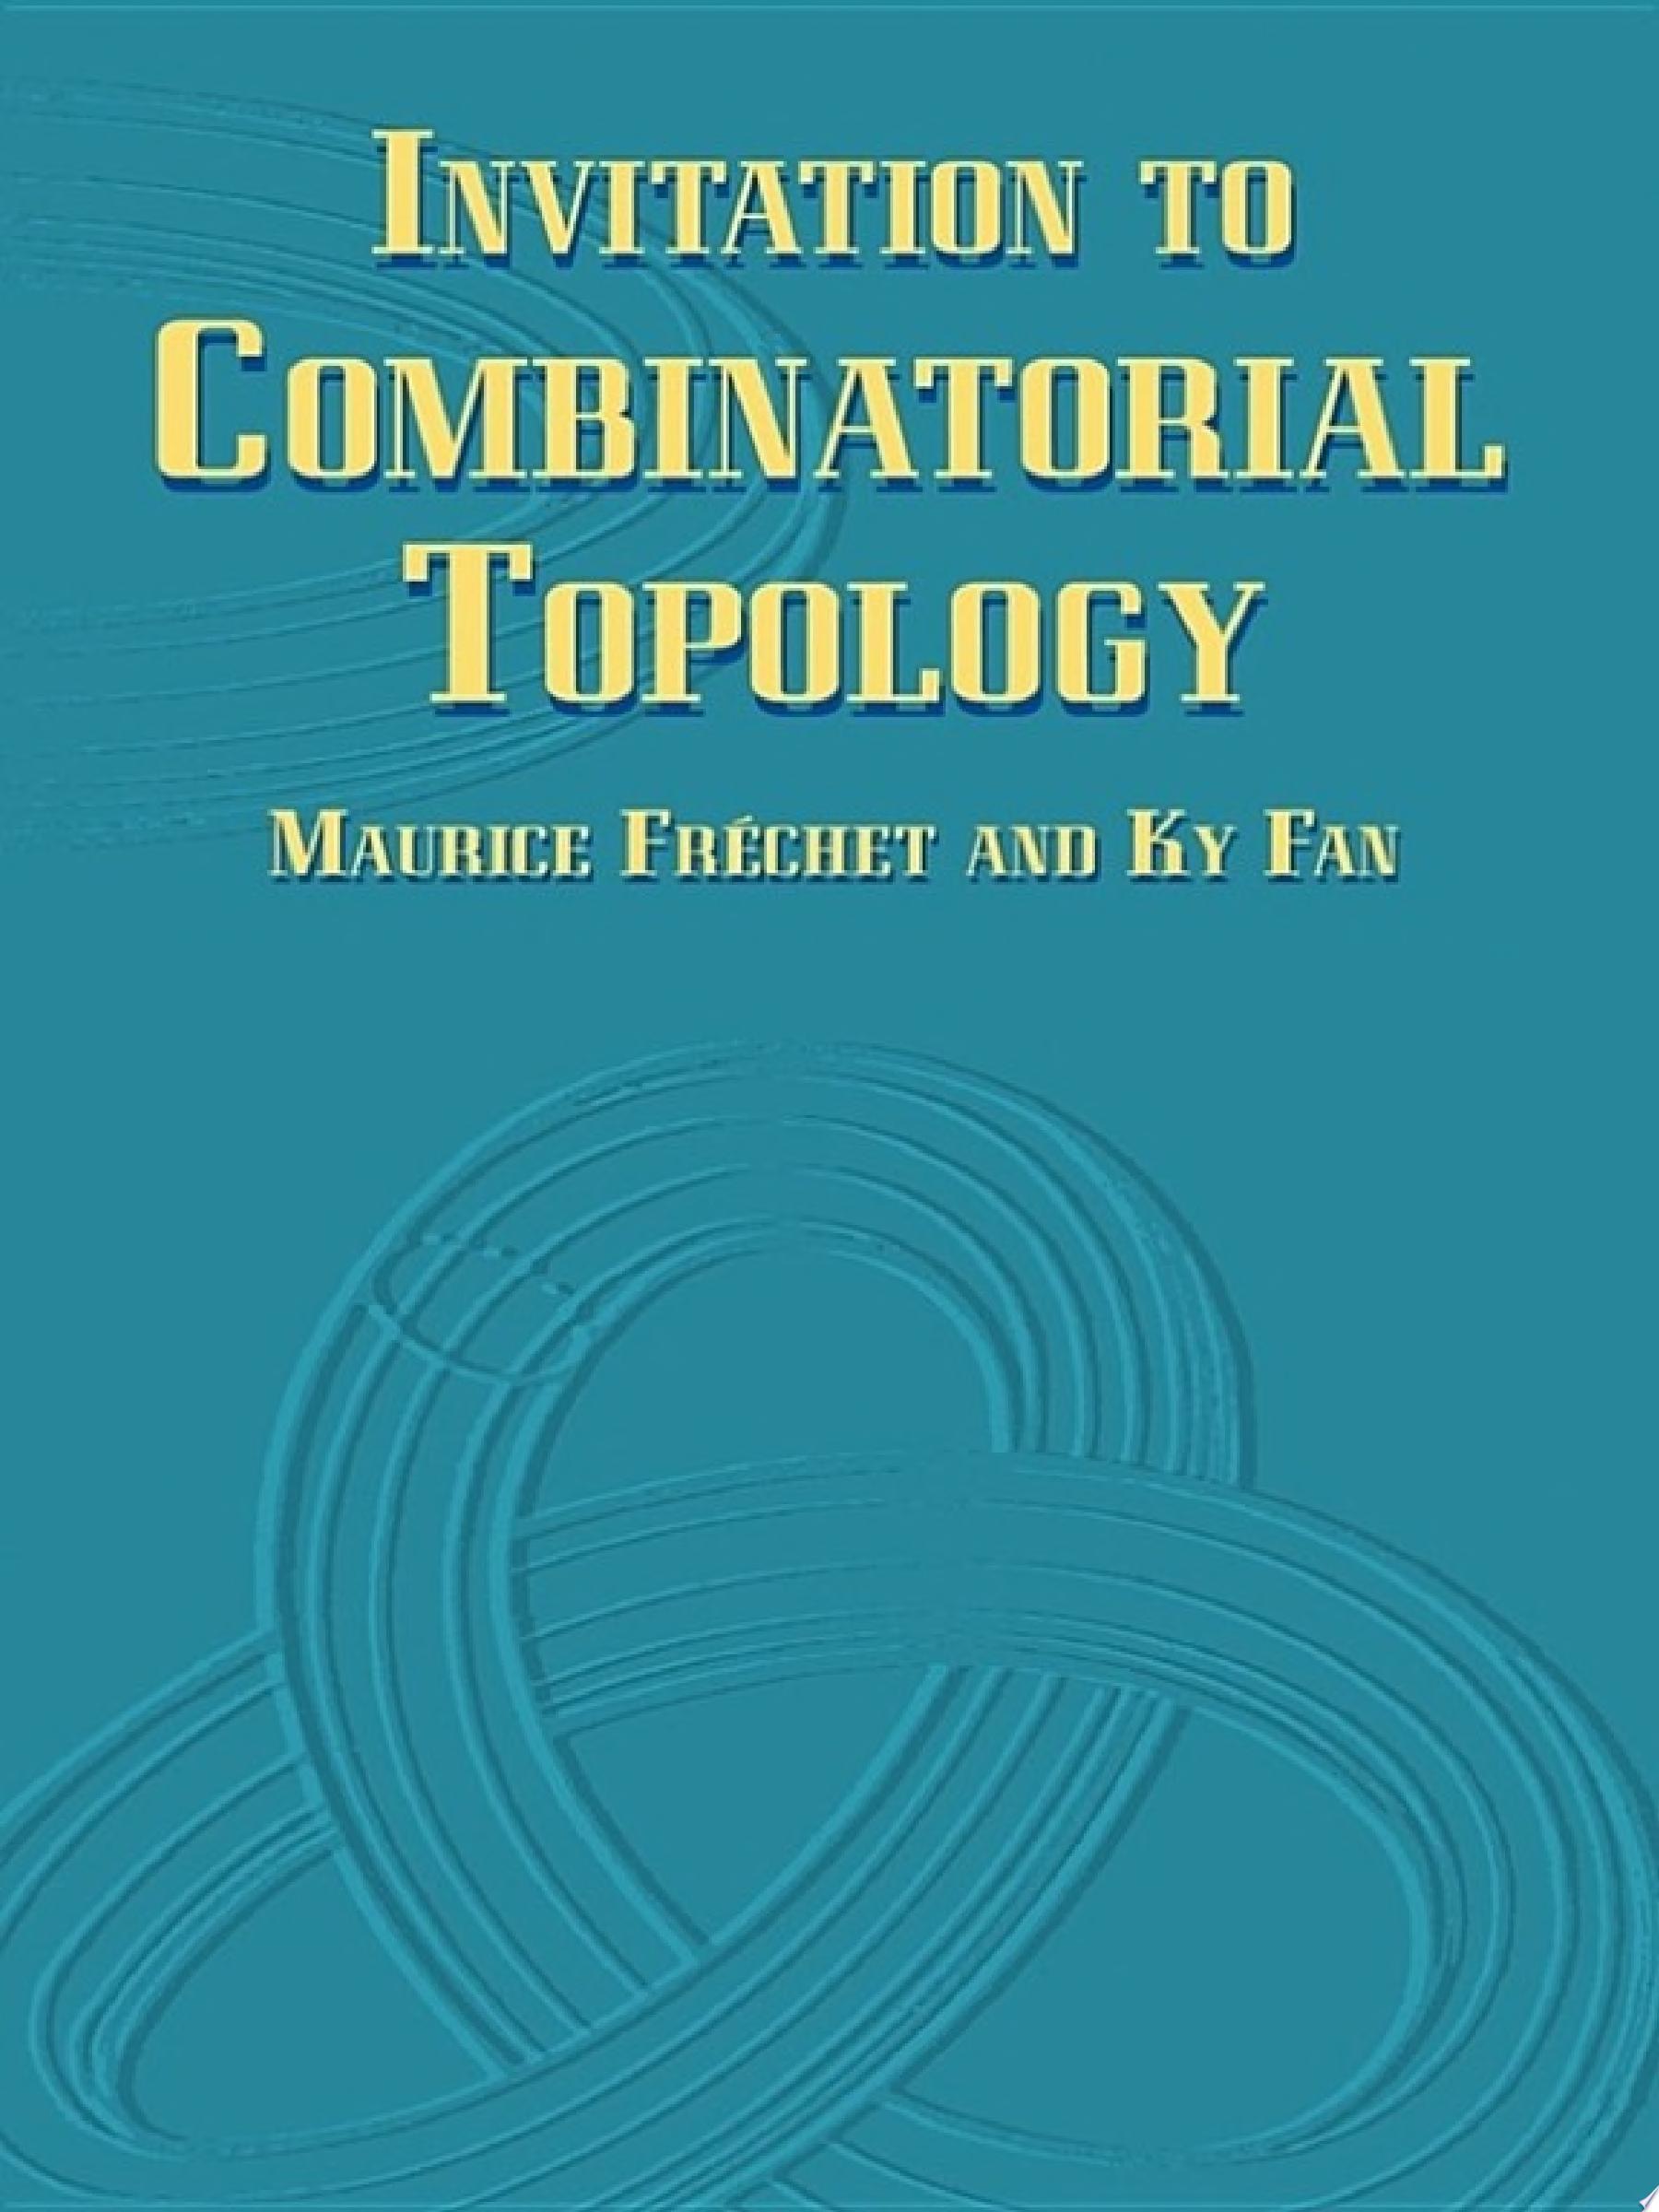 Invitation to Combinatorial Topology